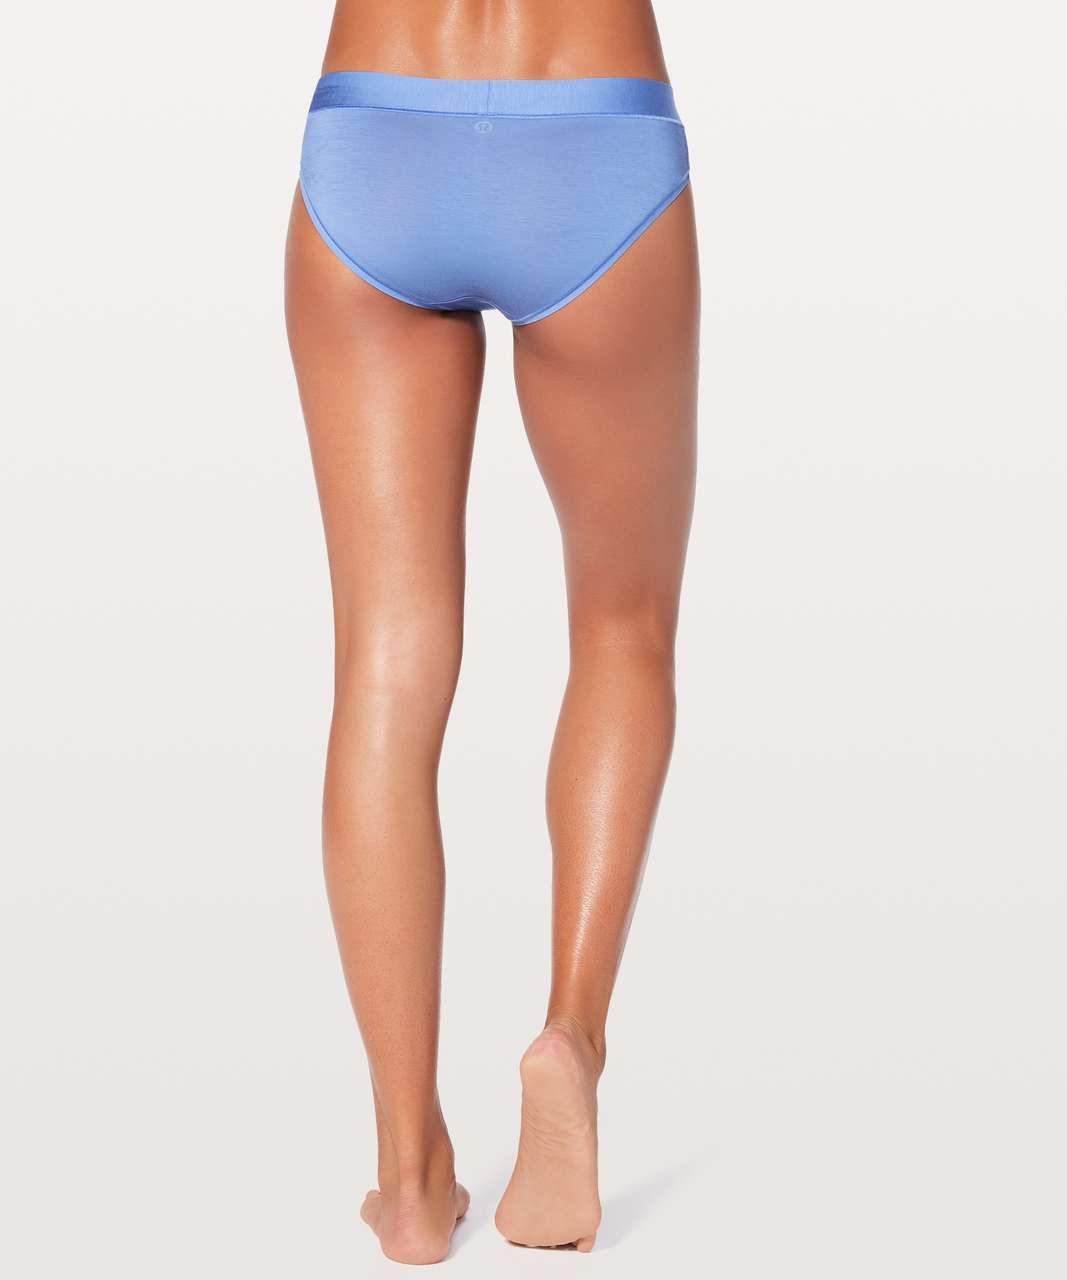 Lululemon Mula Bandhawear Bikini - Light Horizon